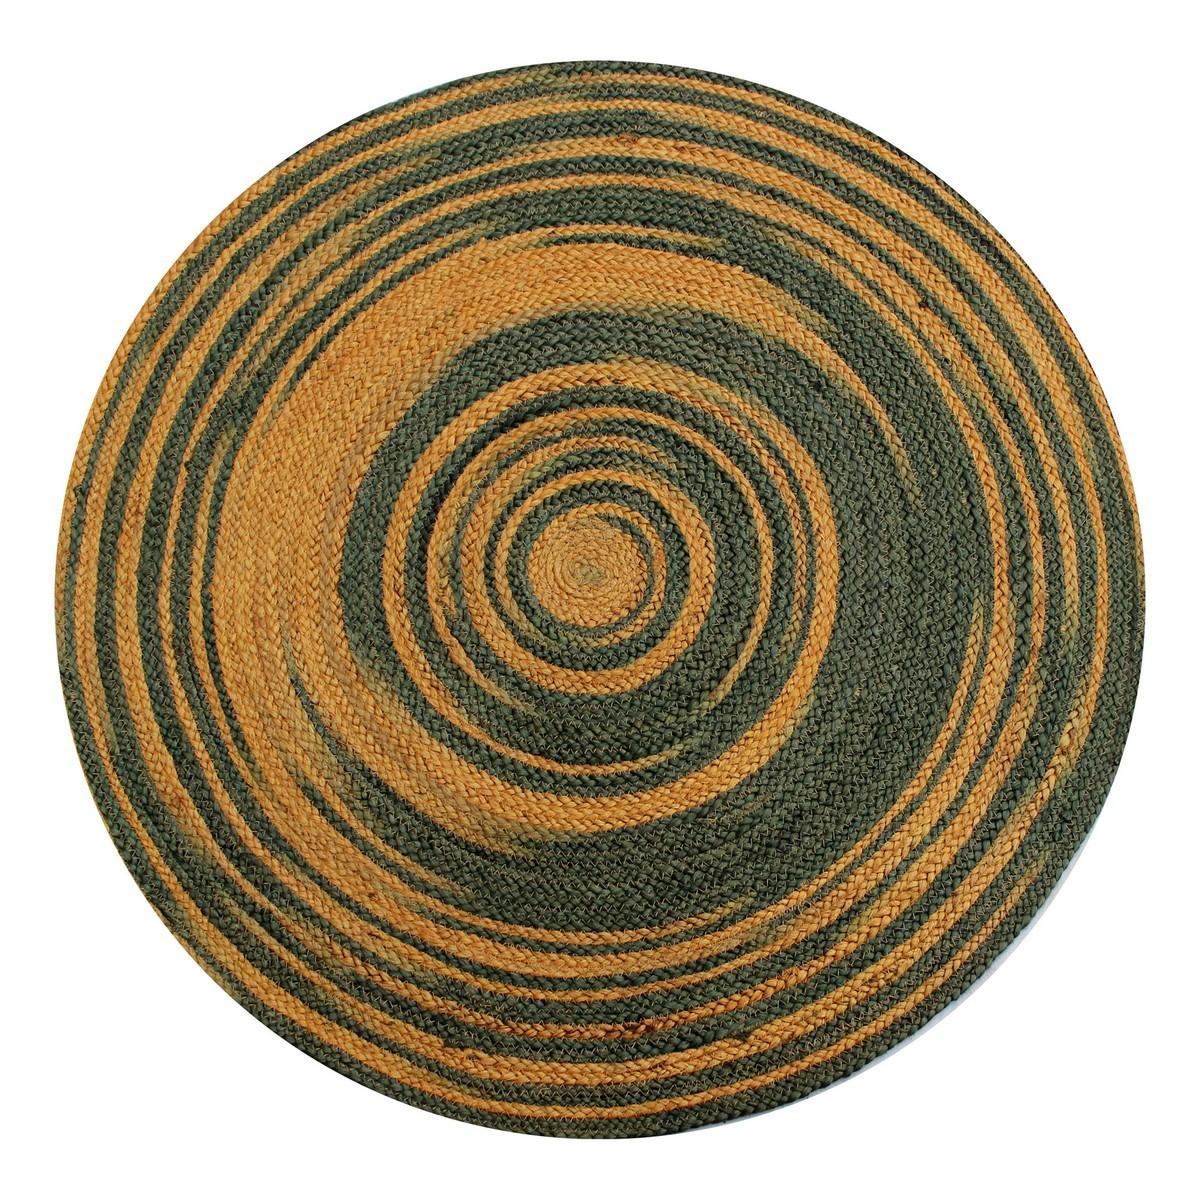 Kerla Spiral Handwoven Round Jute Rug, 100cm, Grey / Gold